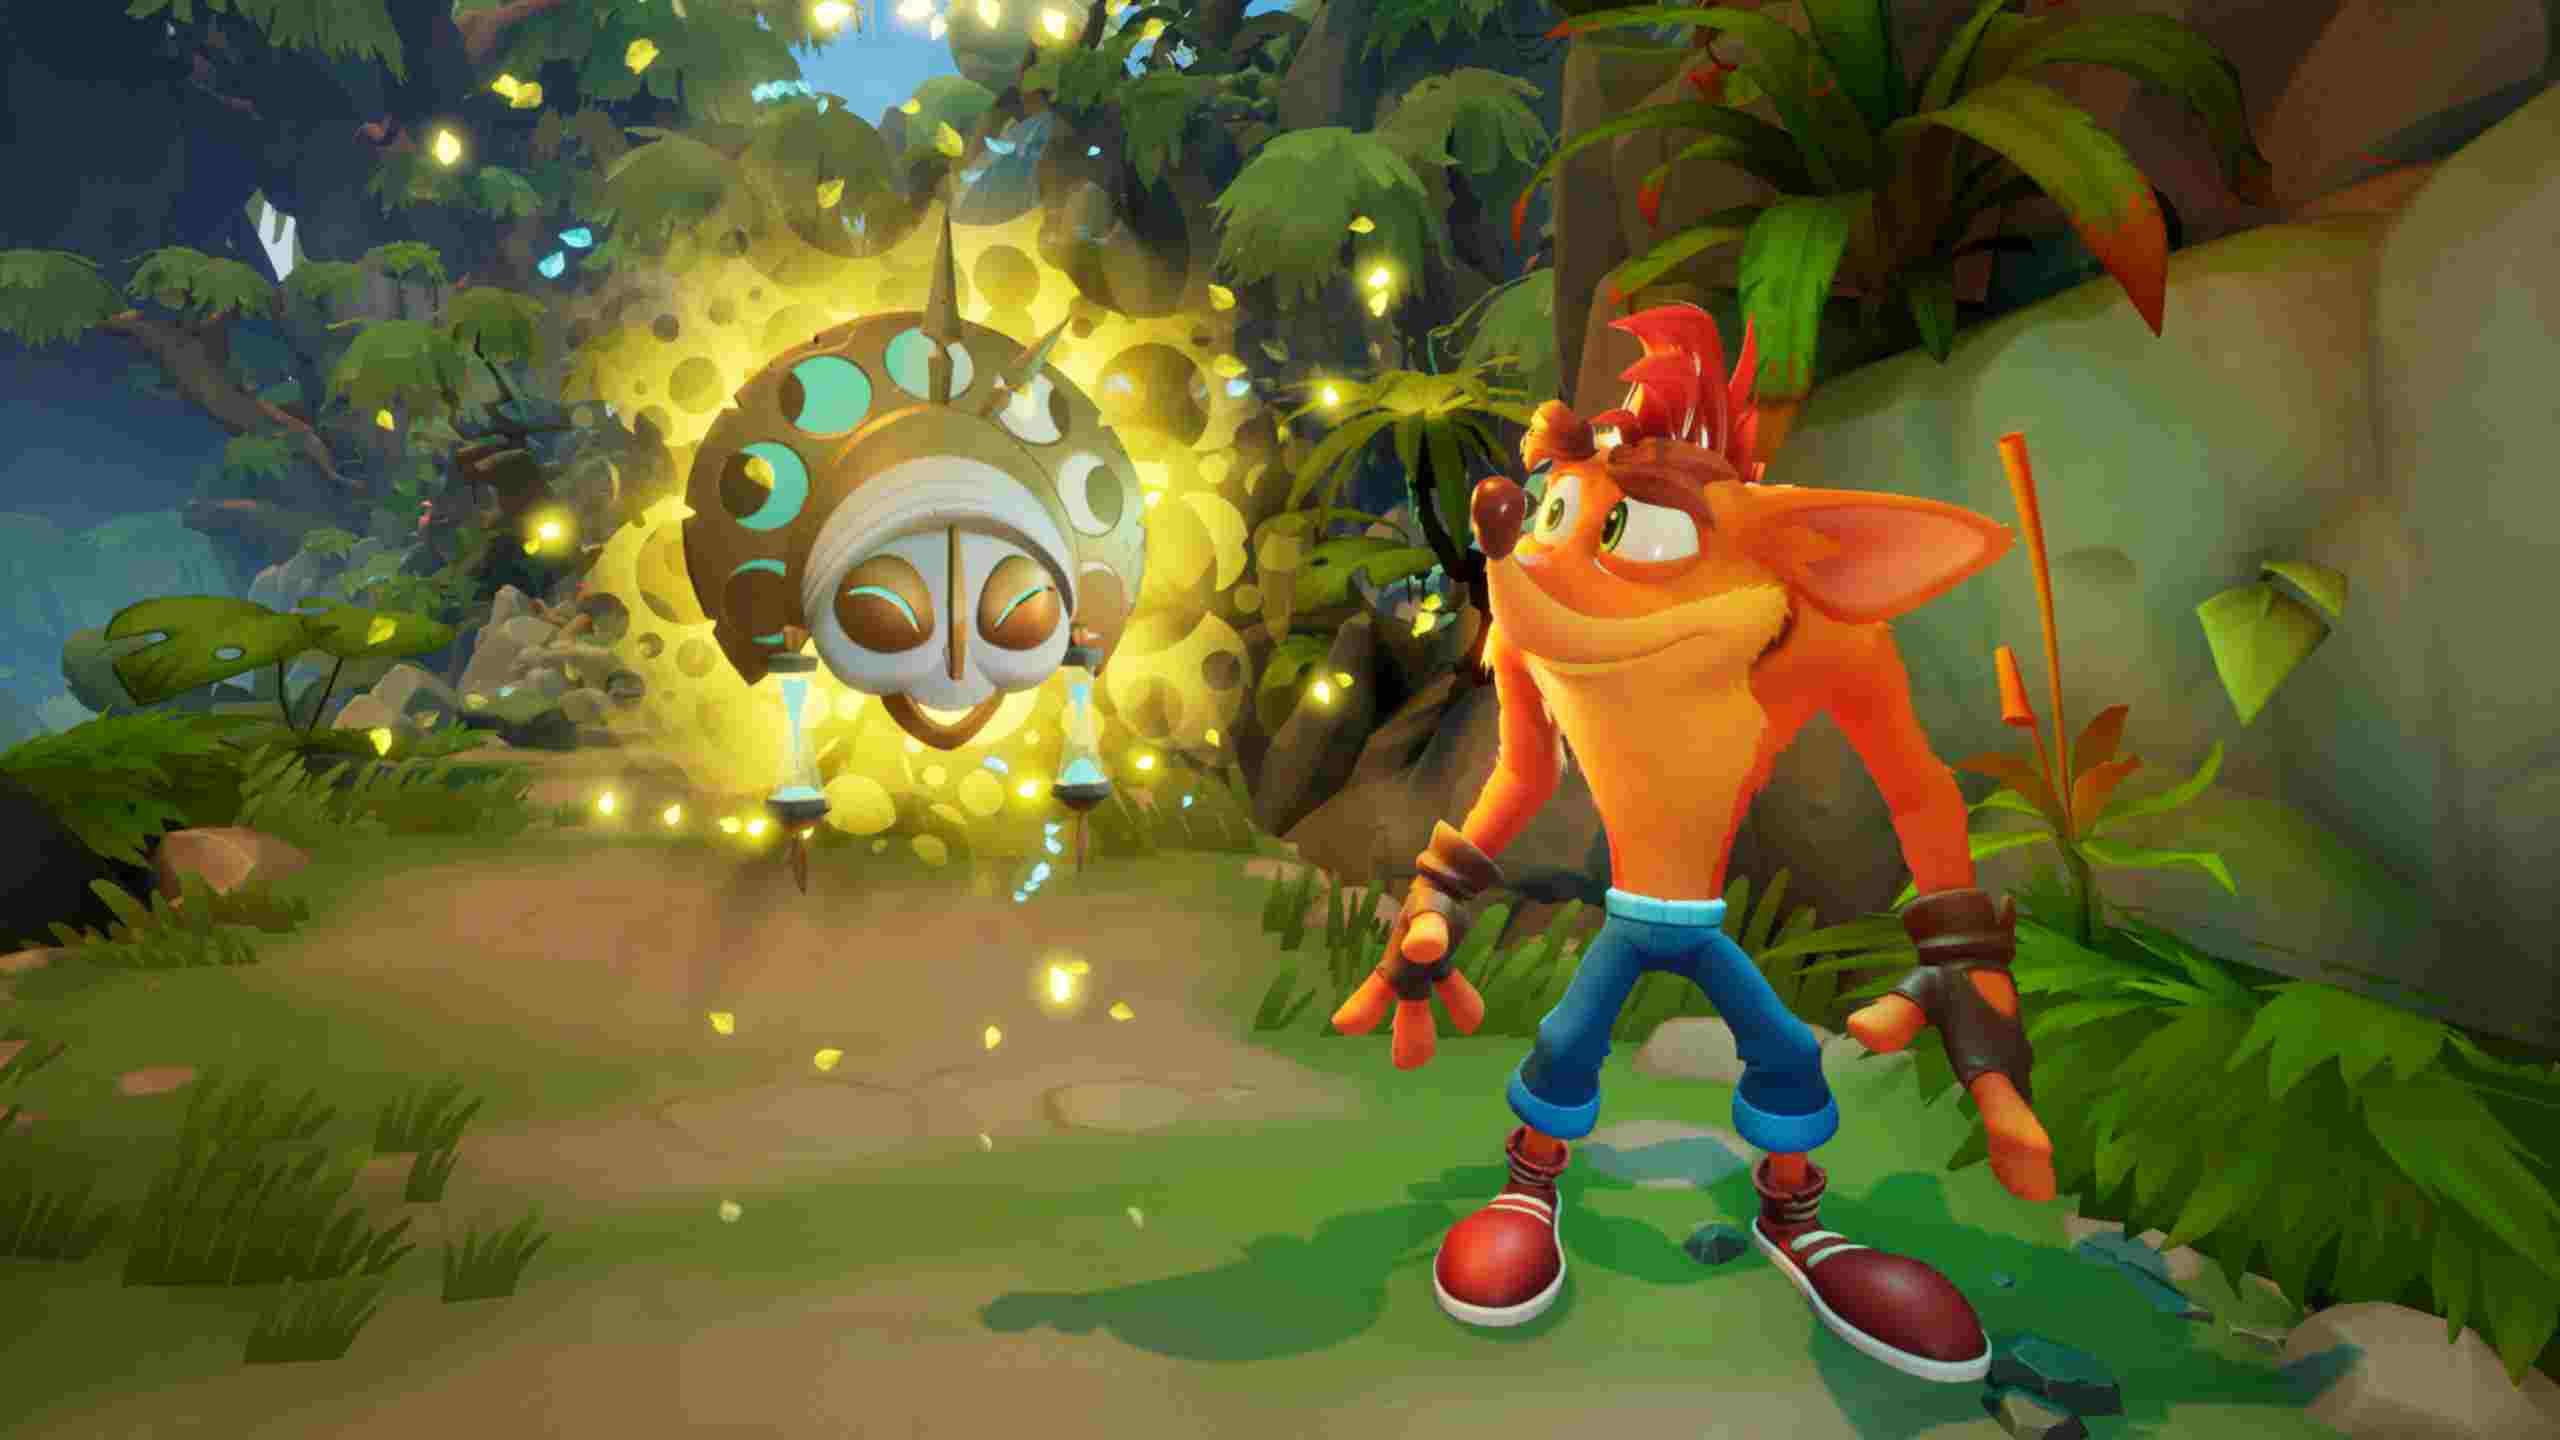 game Crash Bandicoot mod hack